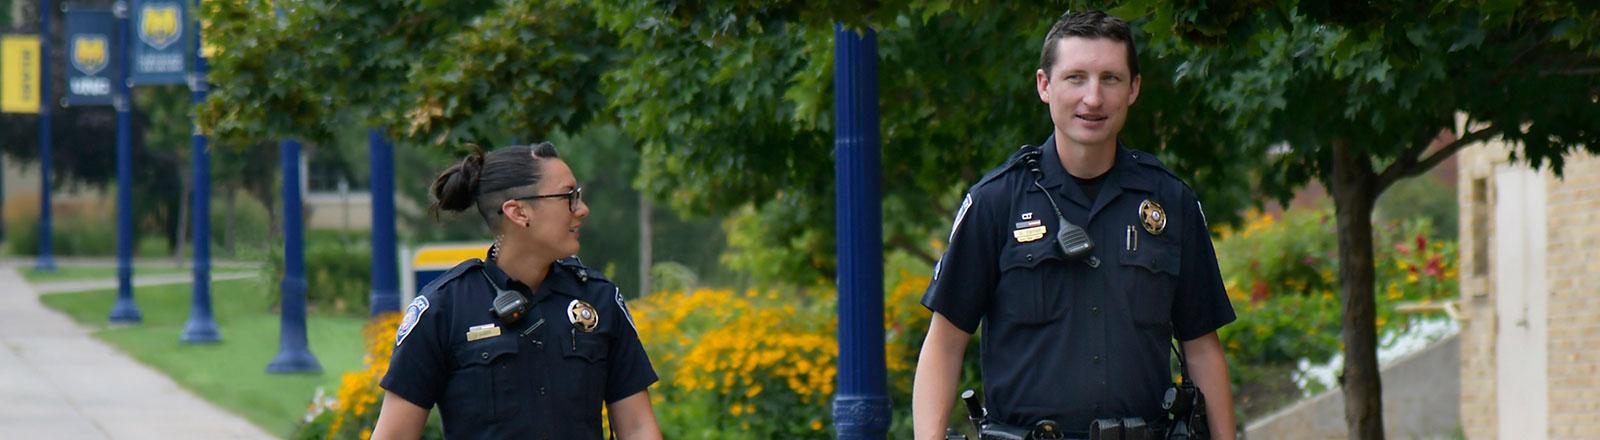 UNC Police Officers on foot patrol